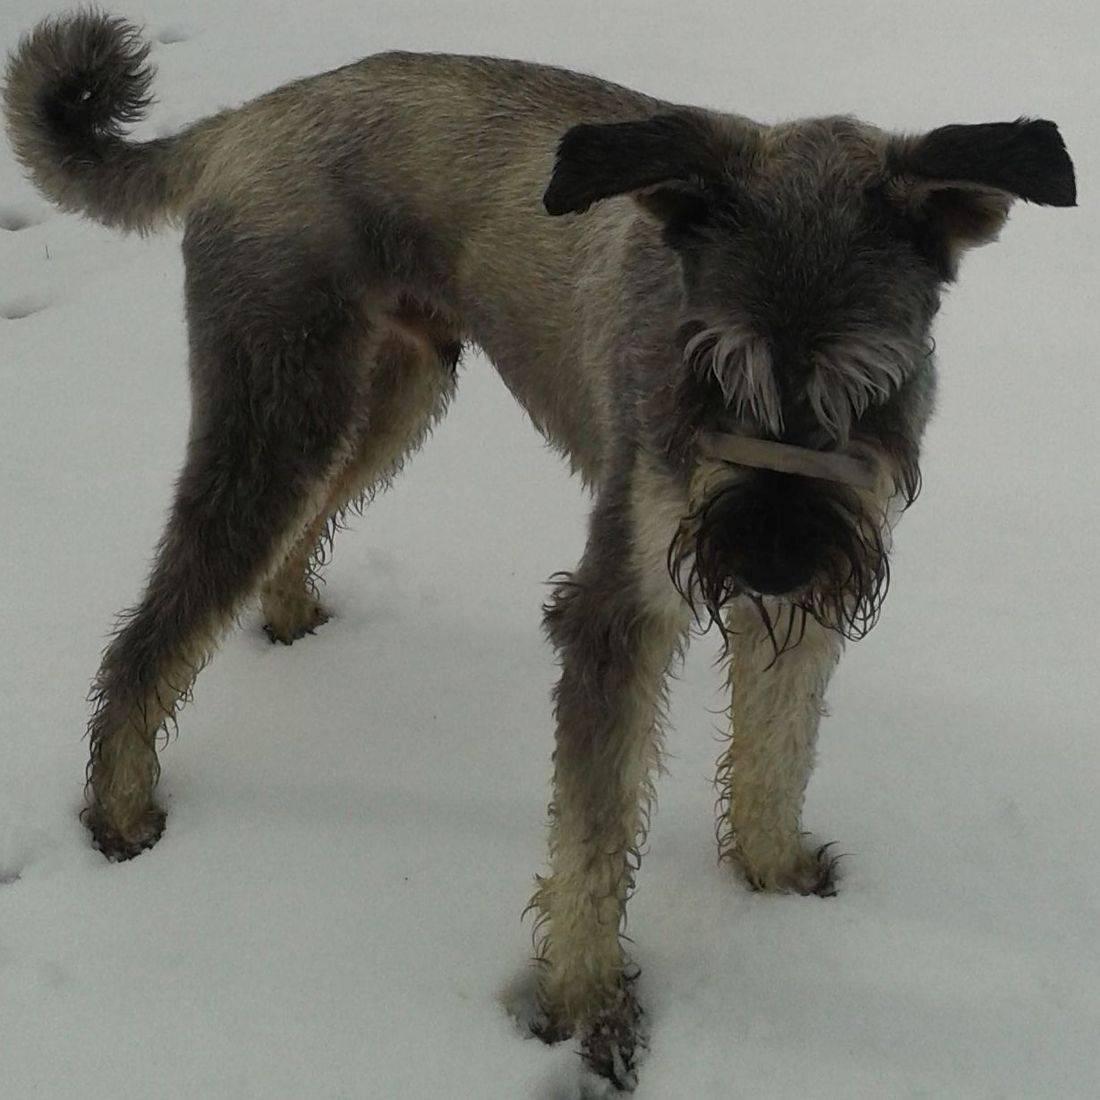 Giant Schnauzer in the snow